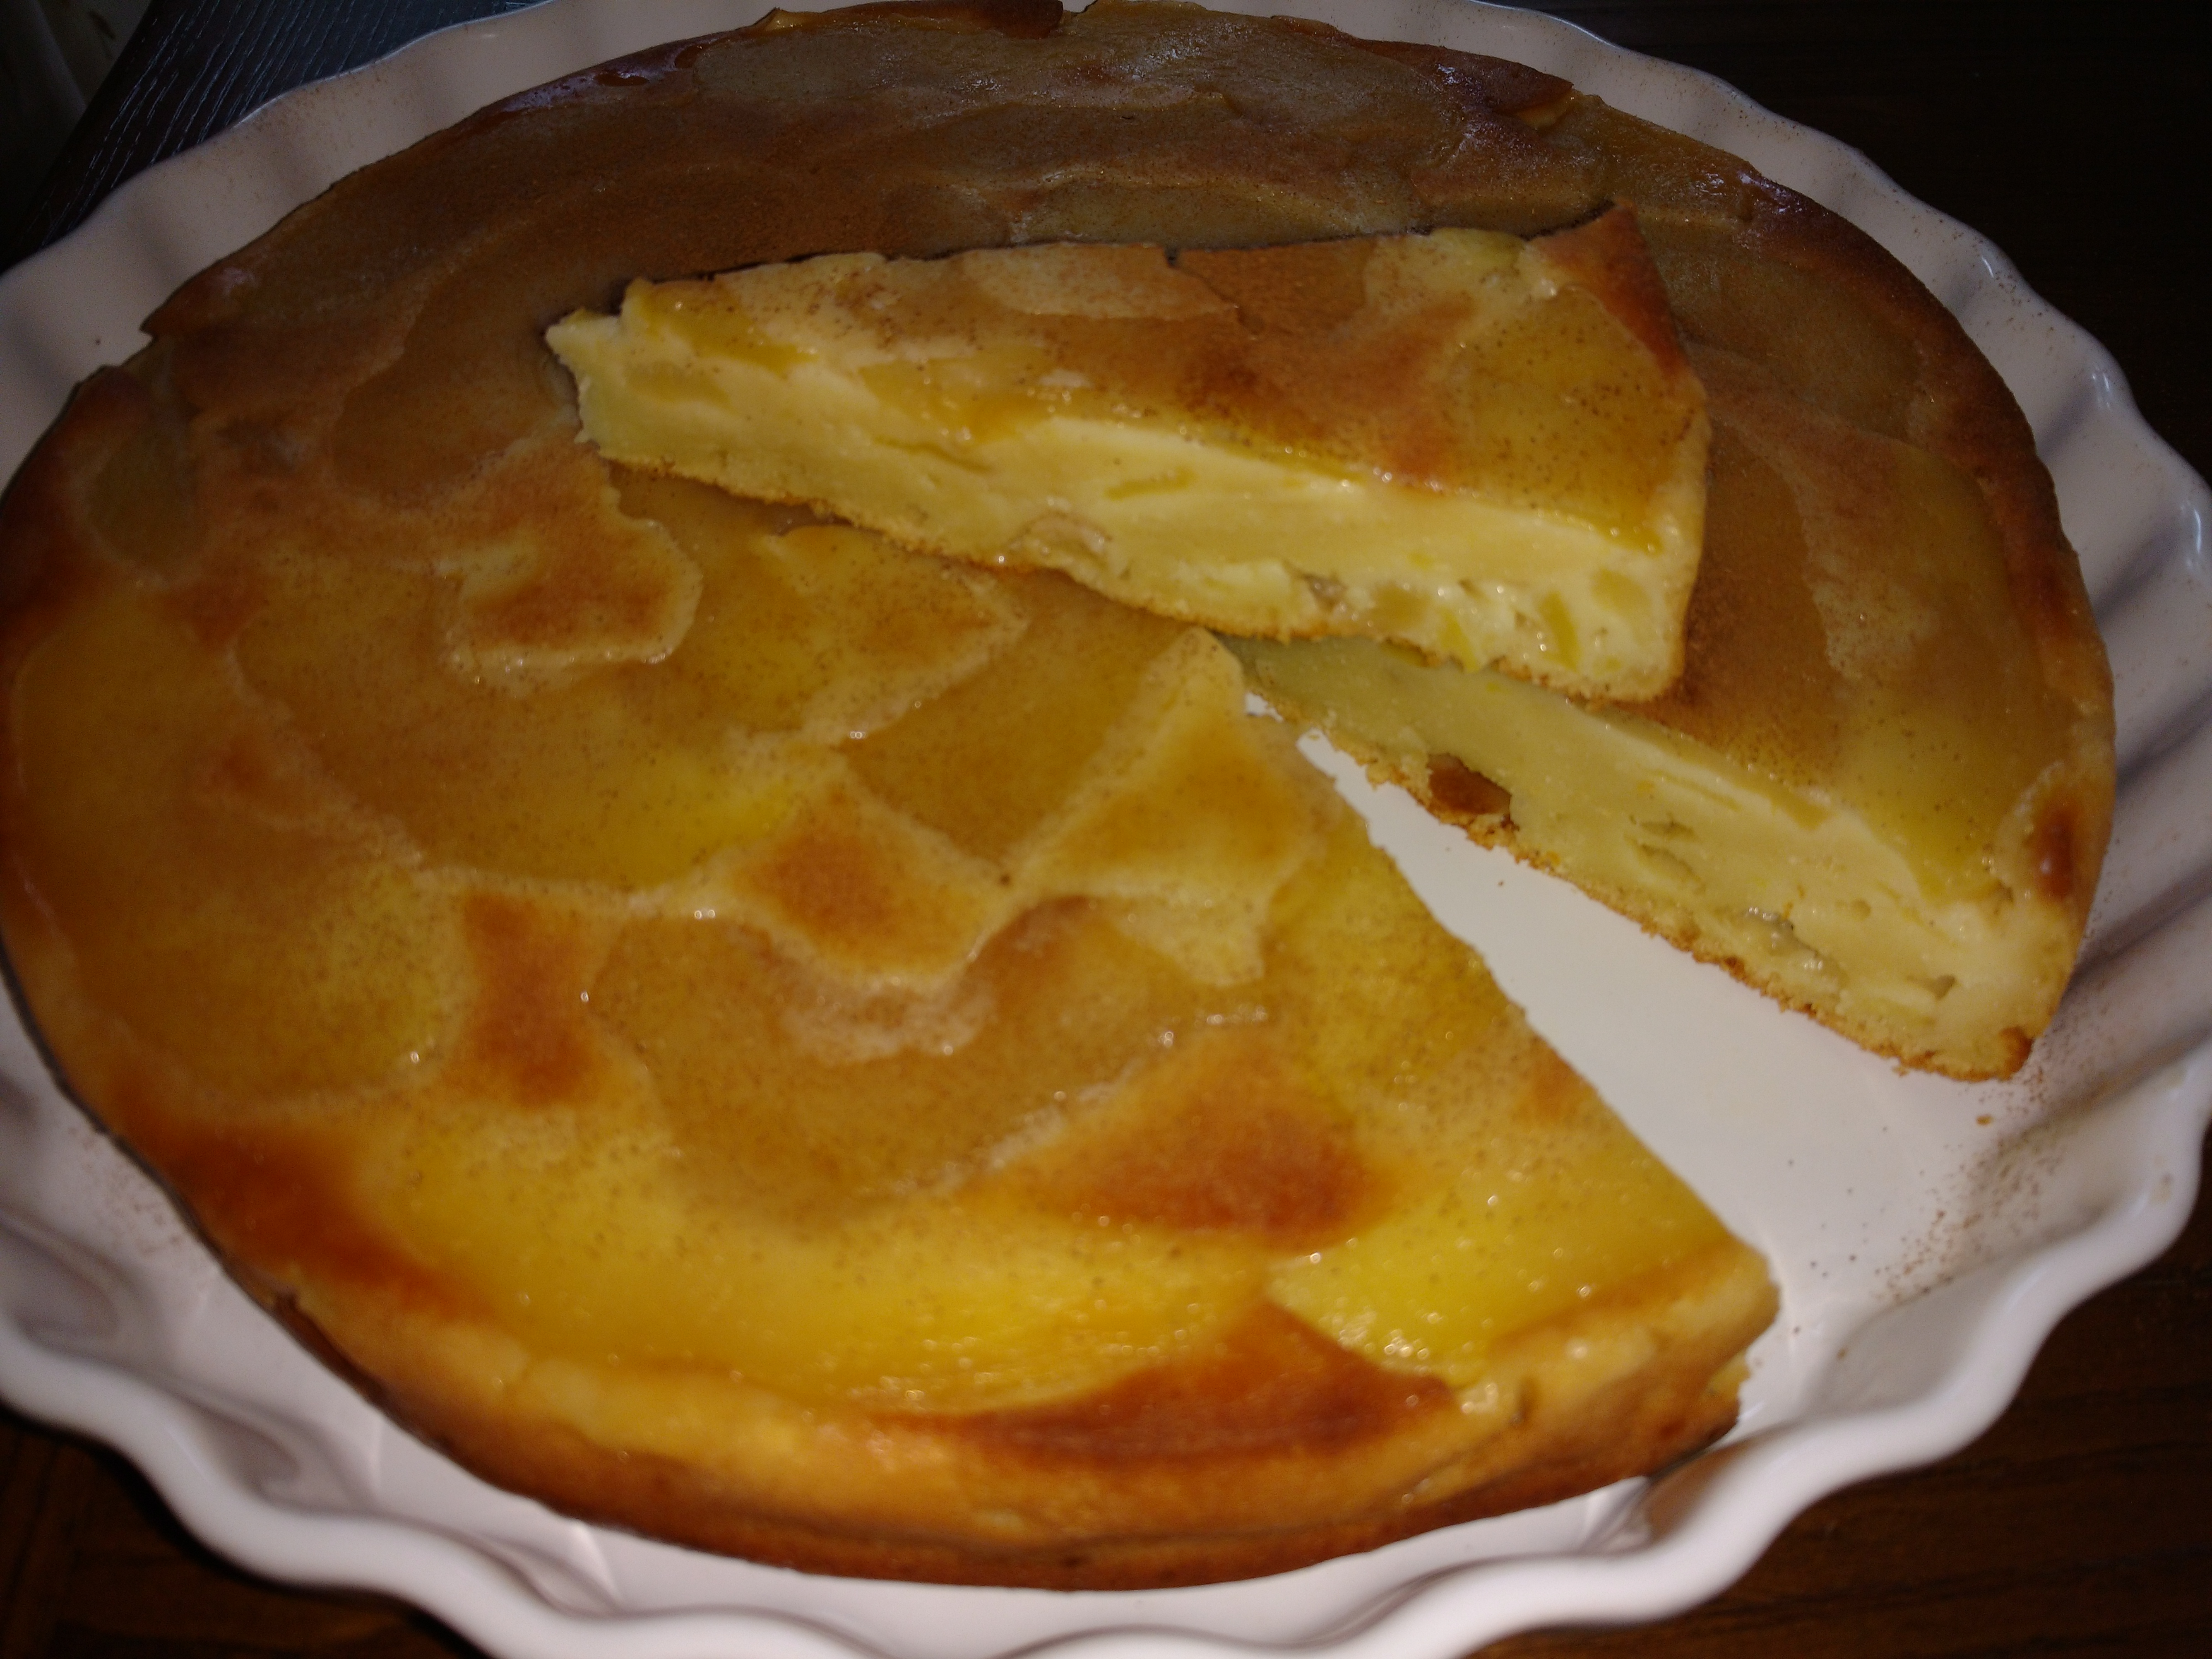 Torta rovesciata di ricotta e mele